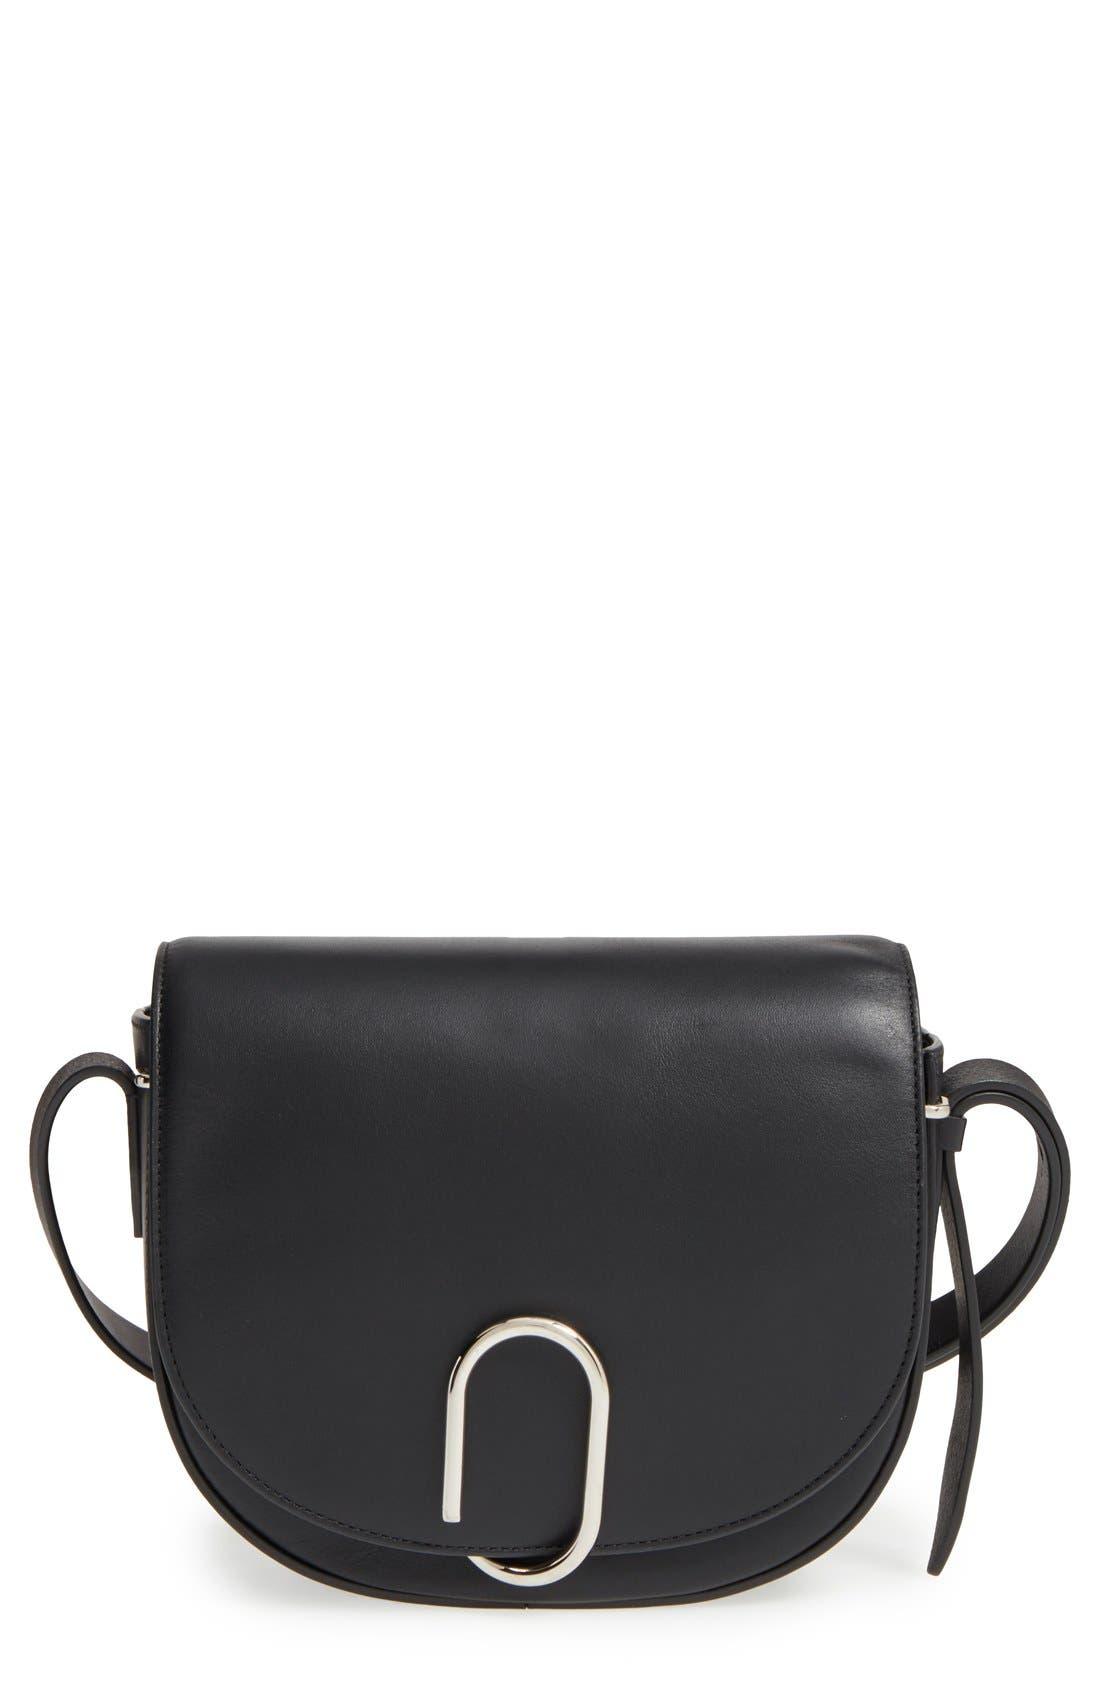 3.1 Phillip Lim Alix Leather Saddle Bag